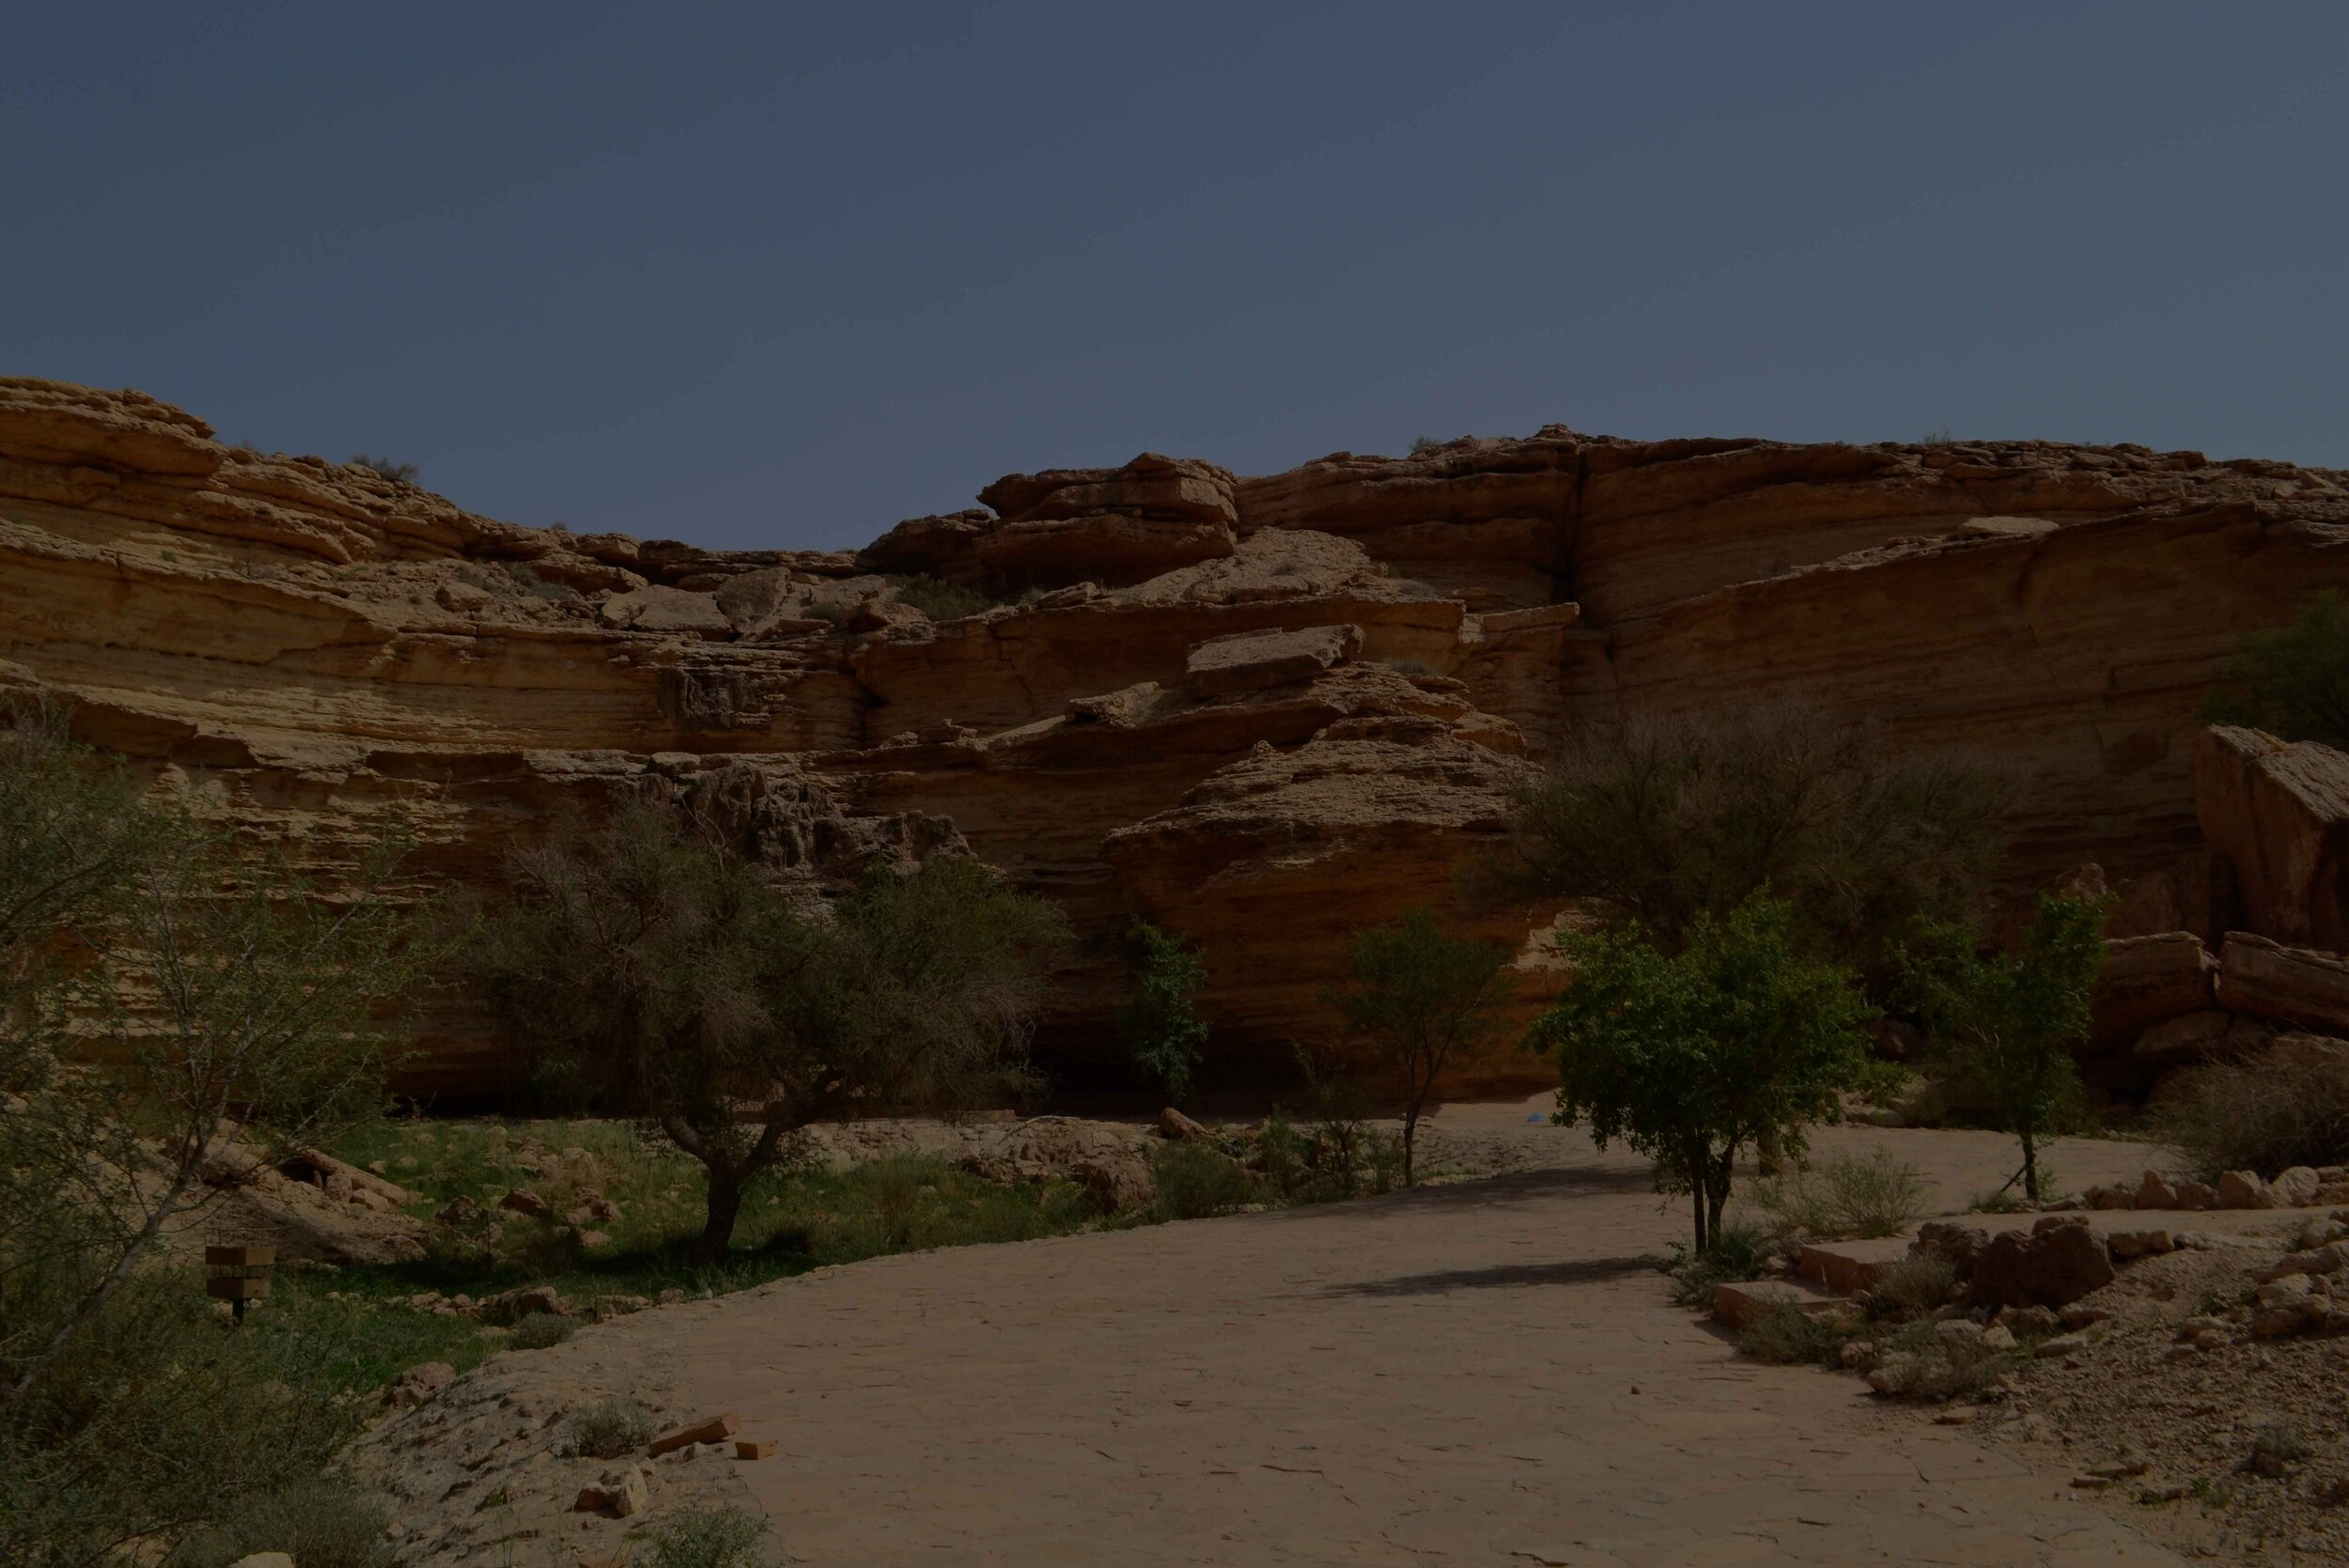 KSA-National-Parks-Master-Plan-1.jpg